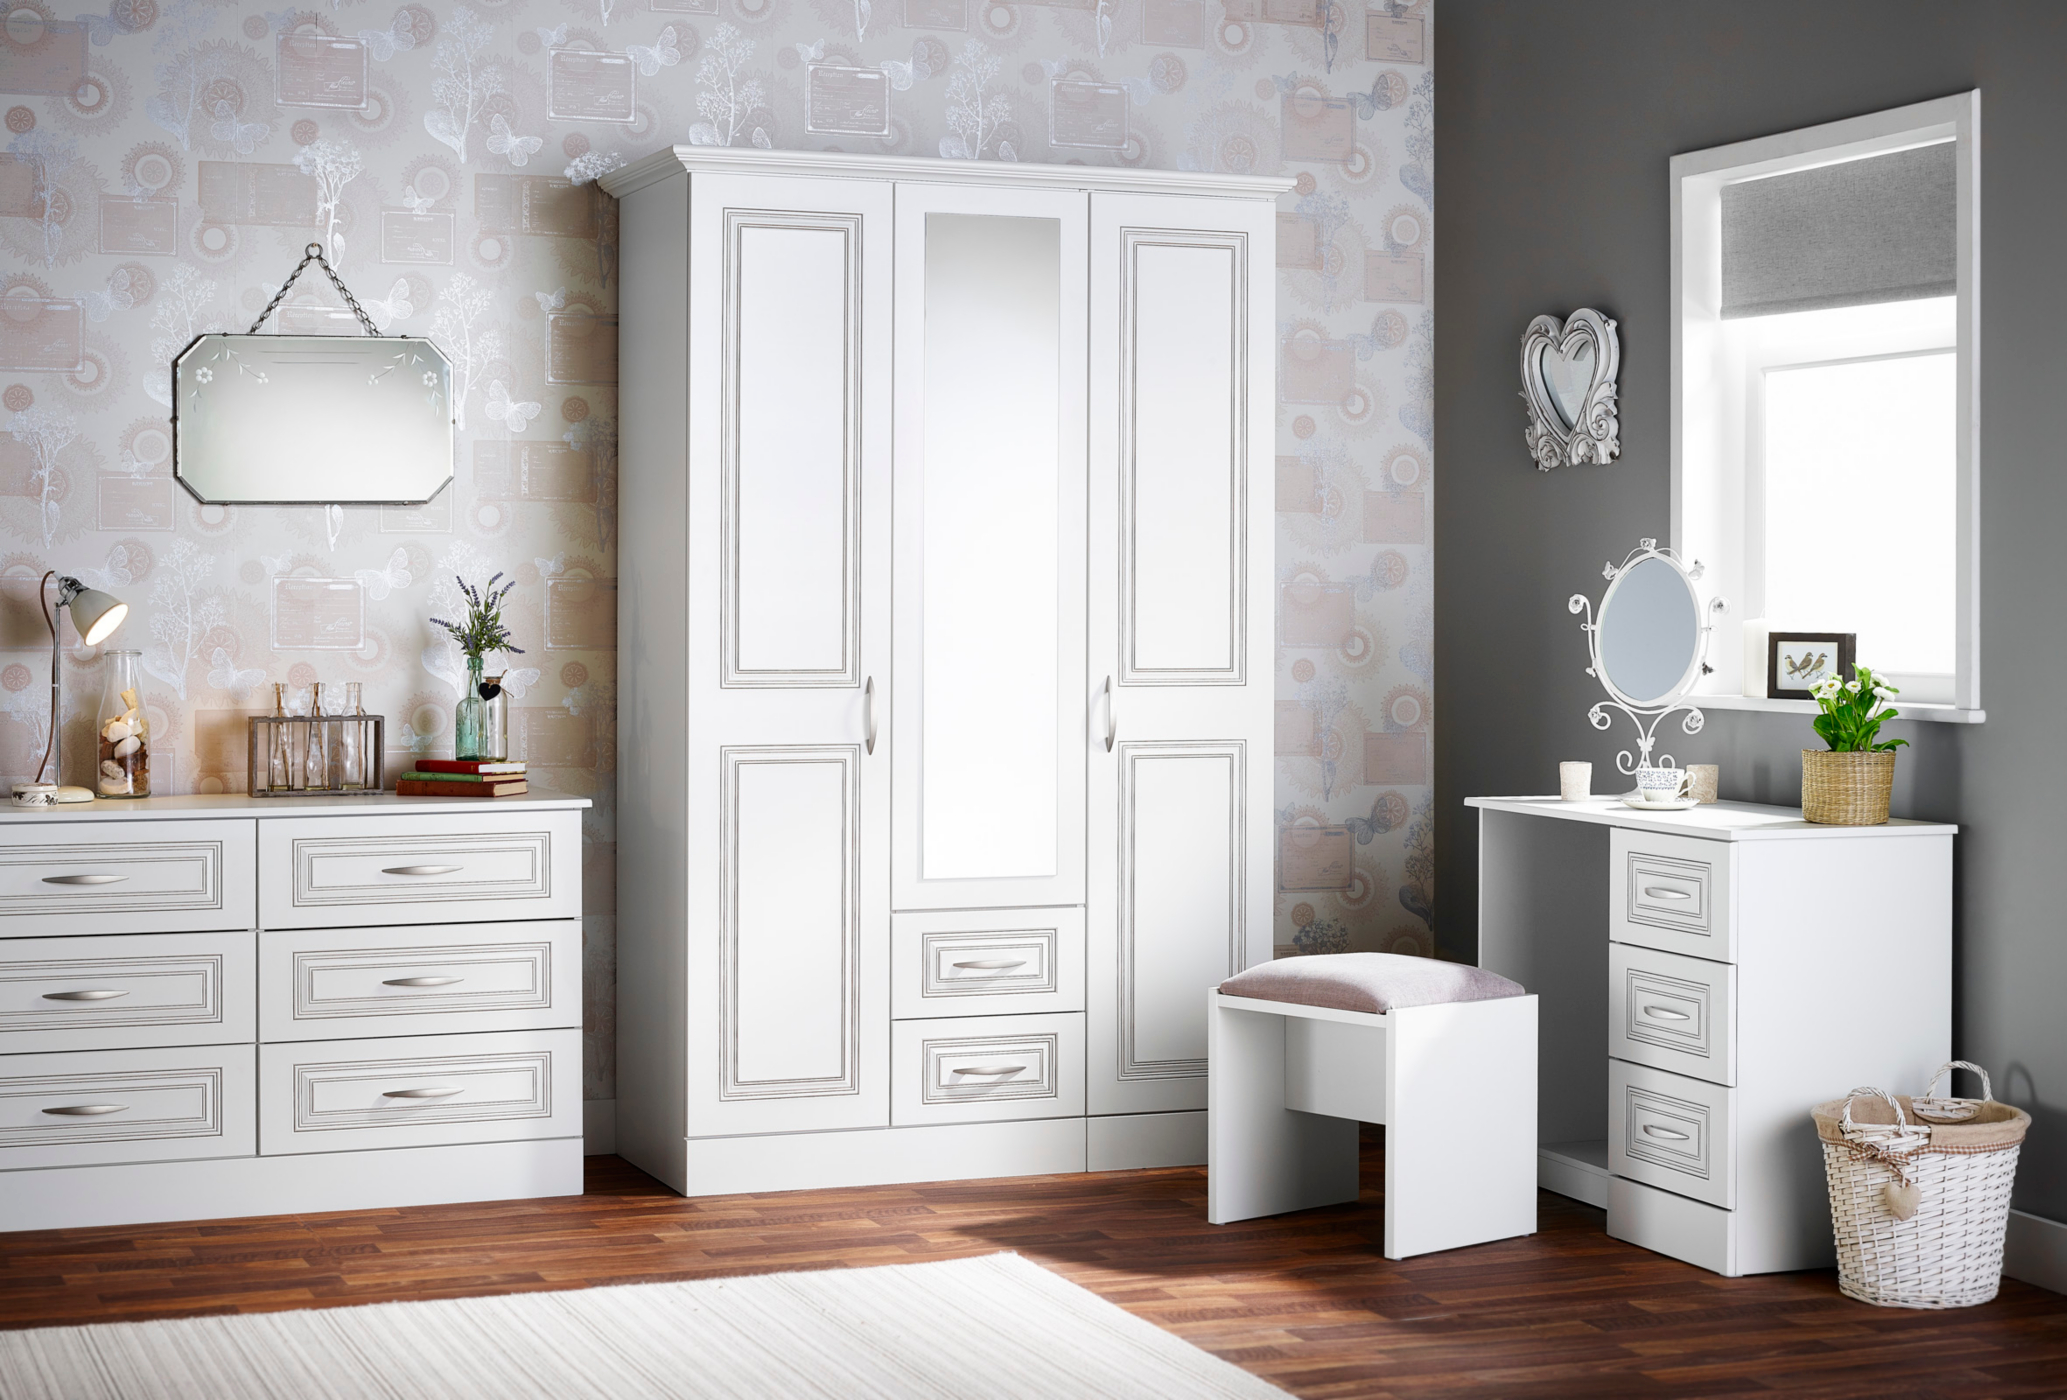 Grange Bedroom Furniture Range White Bedroom George at ASDA